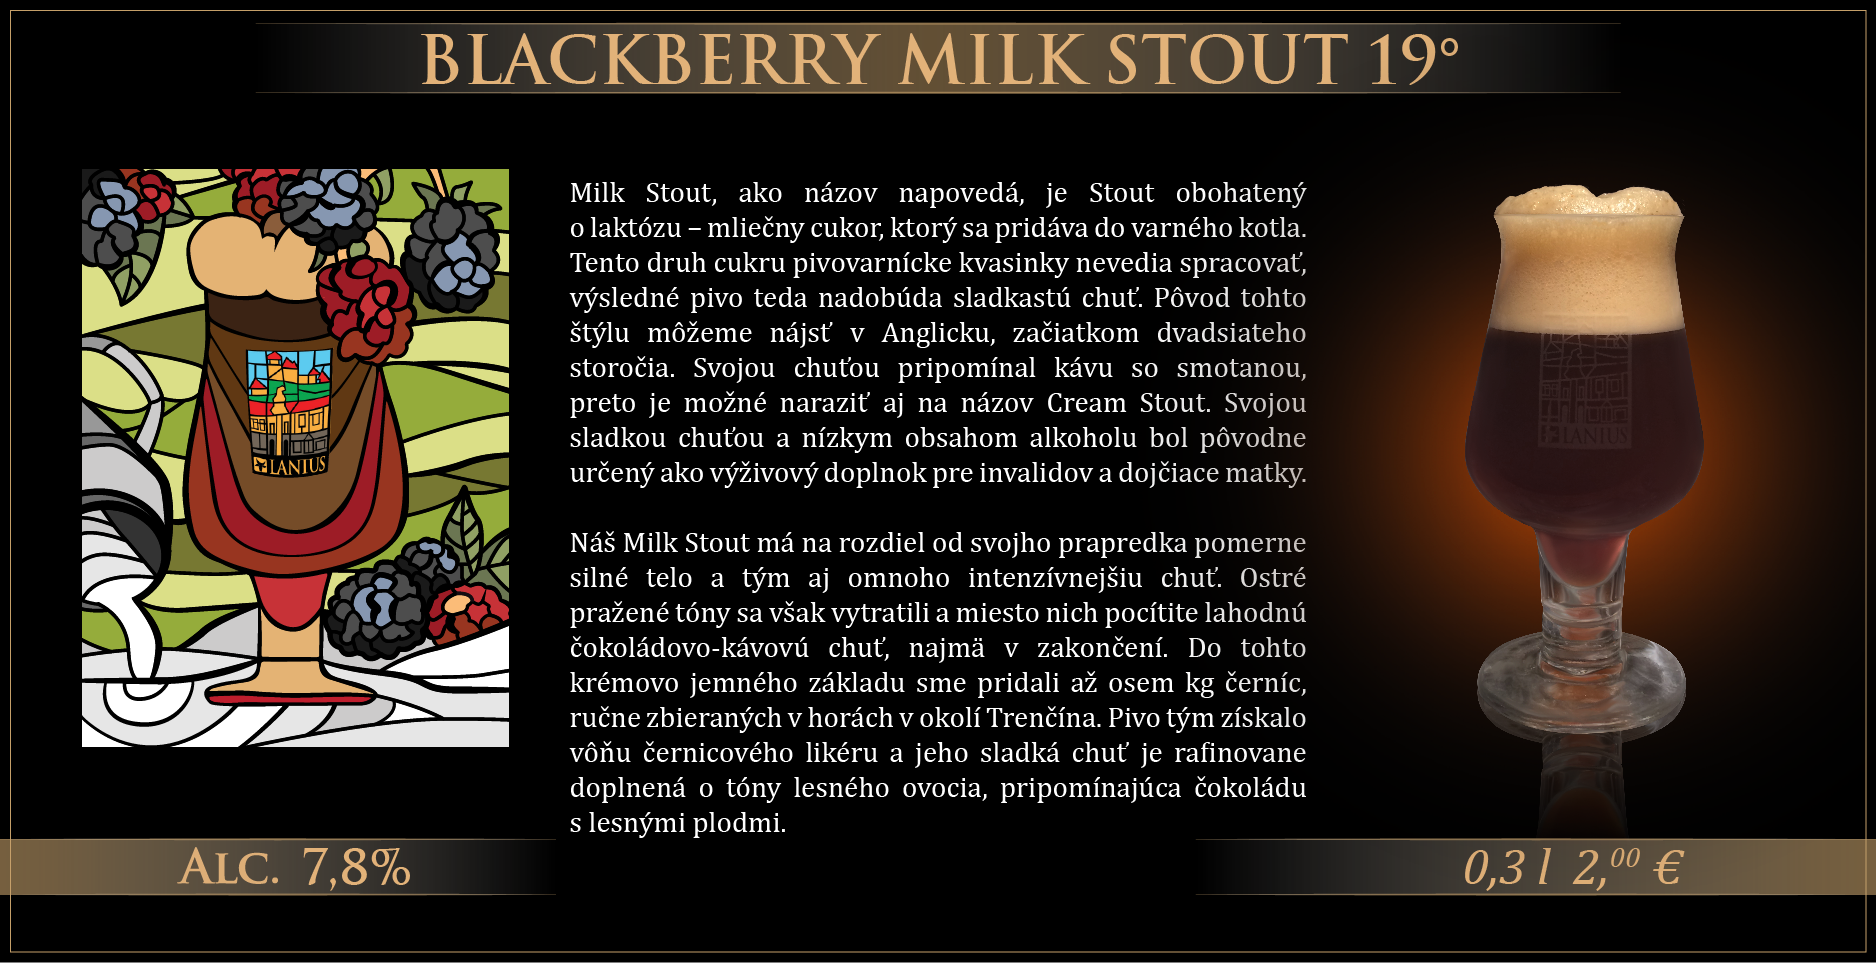 Blackberry Milk Stout 19 web-01-02